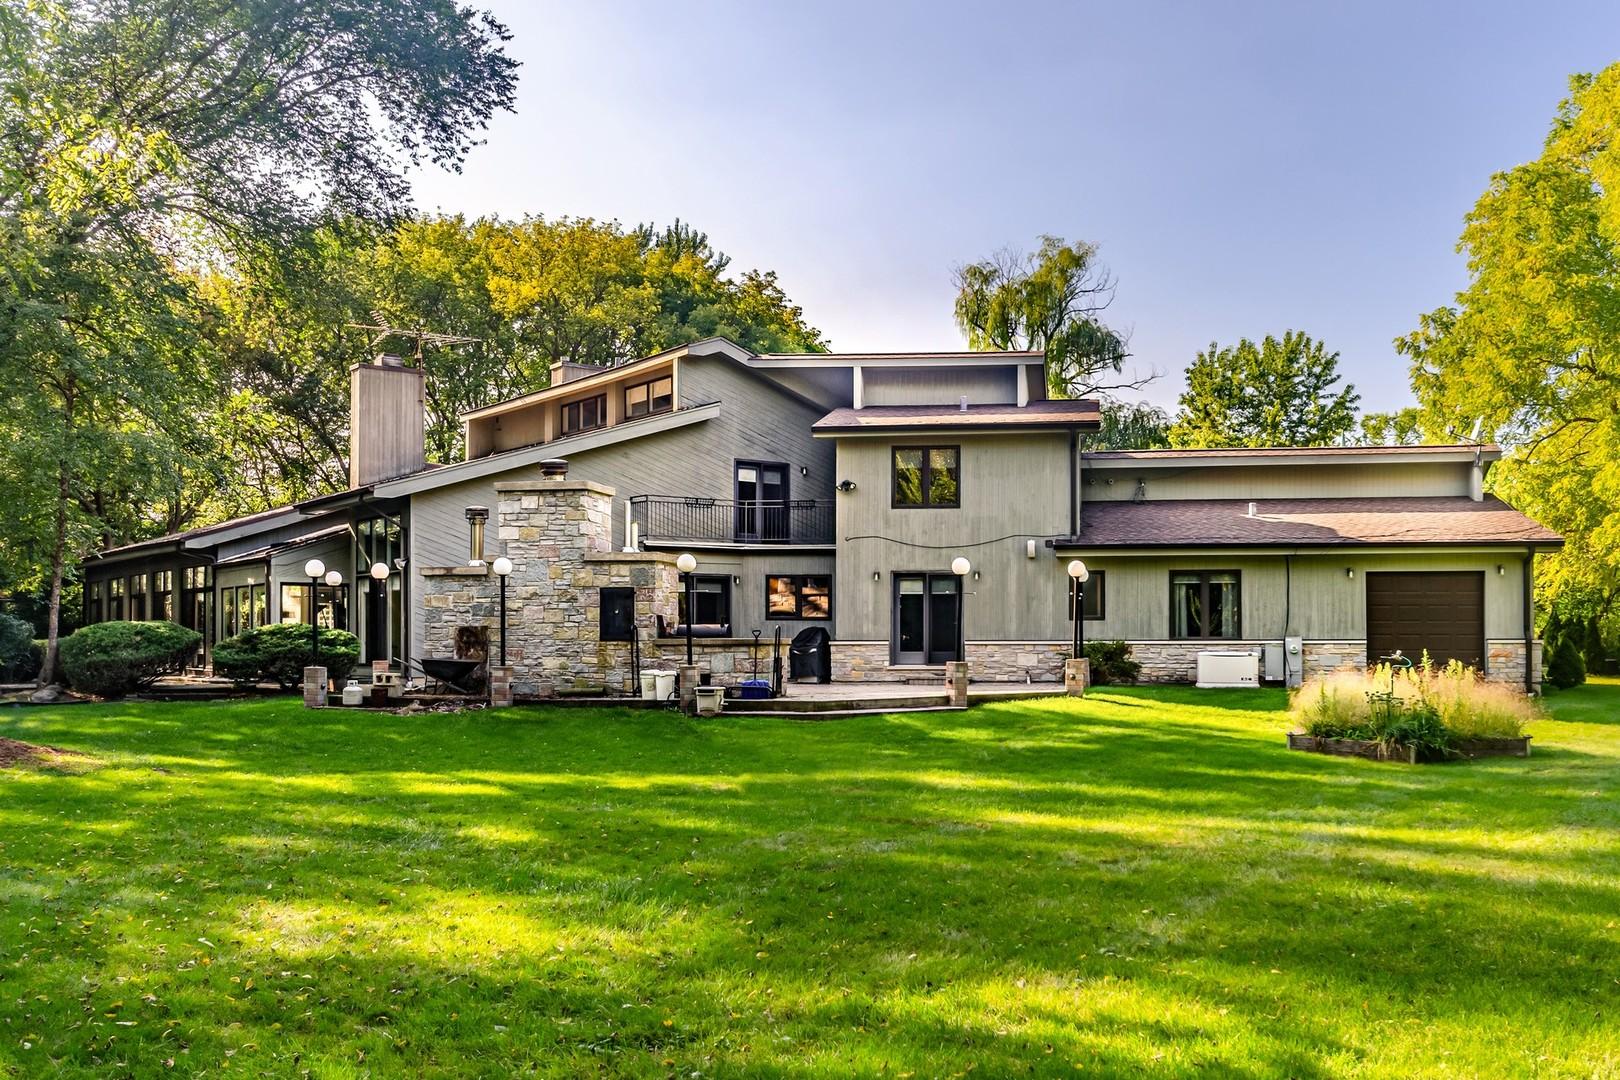 955 Gage, Lake Forest, Illinois, 60045